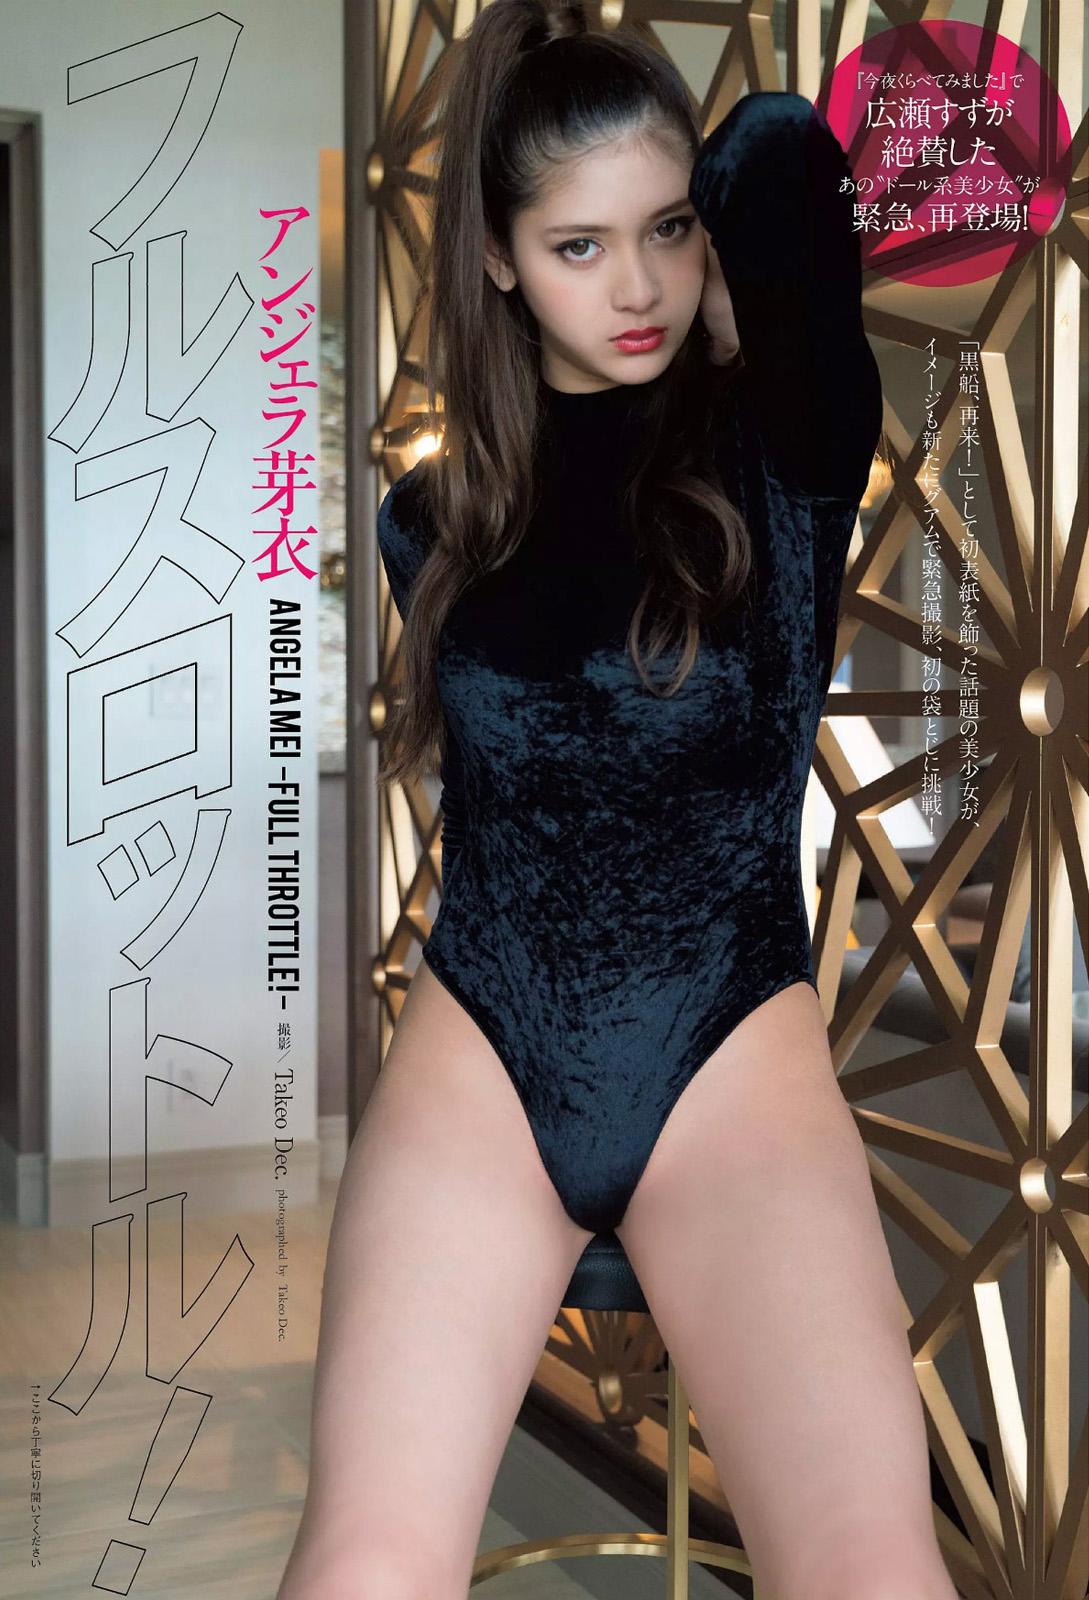 Angela Mei アンジェラ芽衣, Weekly Playboy 2017 No.38 (週刊プレイボーイ 2017年38号)